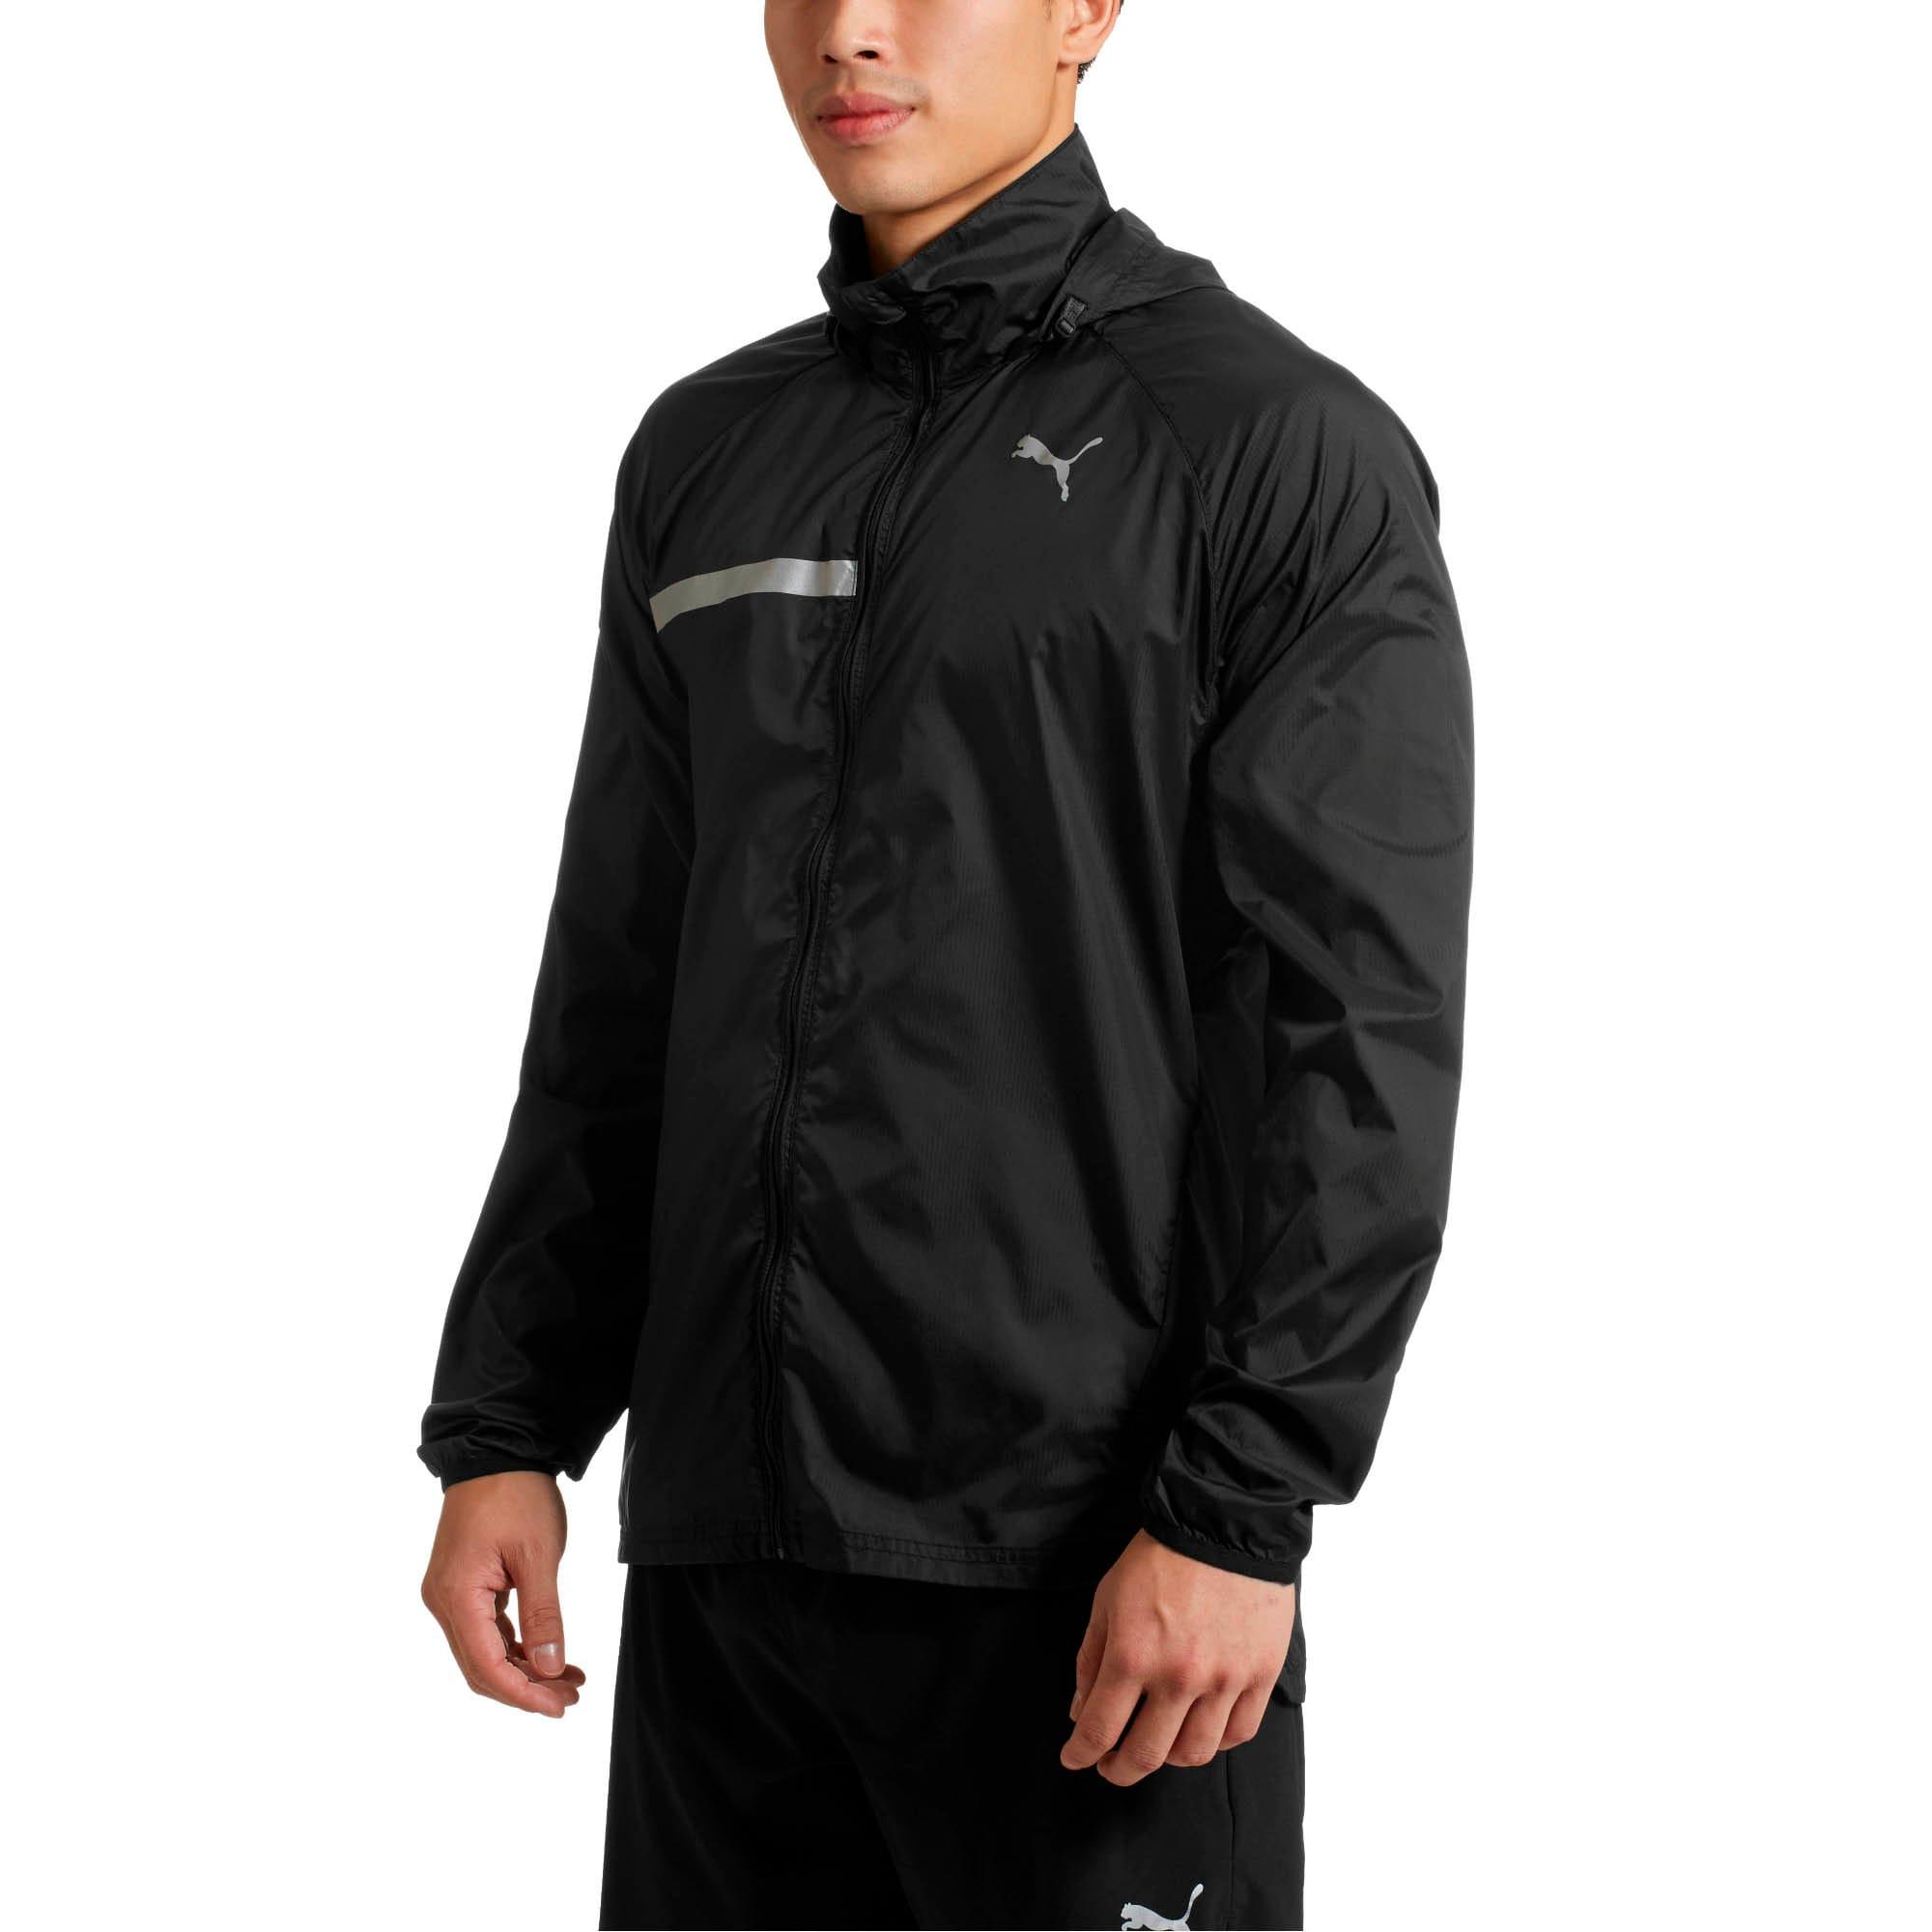 Thumbnail 2 of Lightweight Hooded Men's Jacket, Puma Black, medium